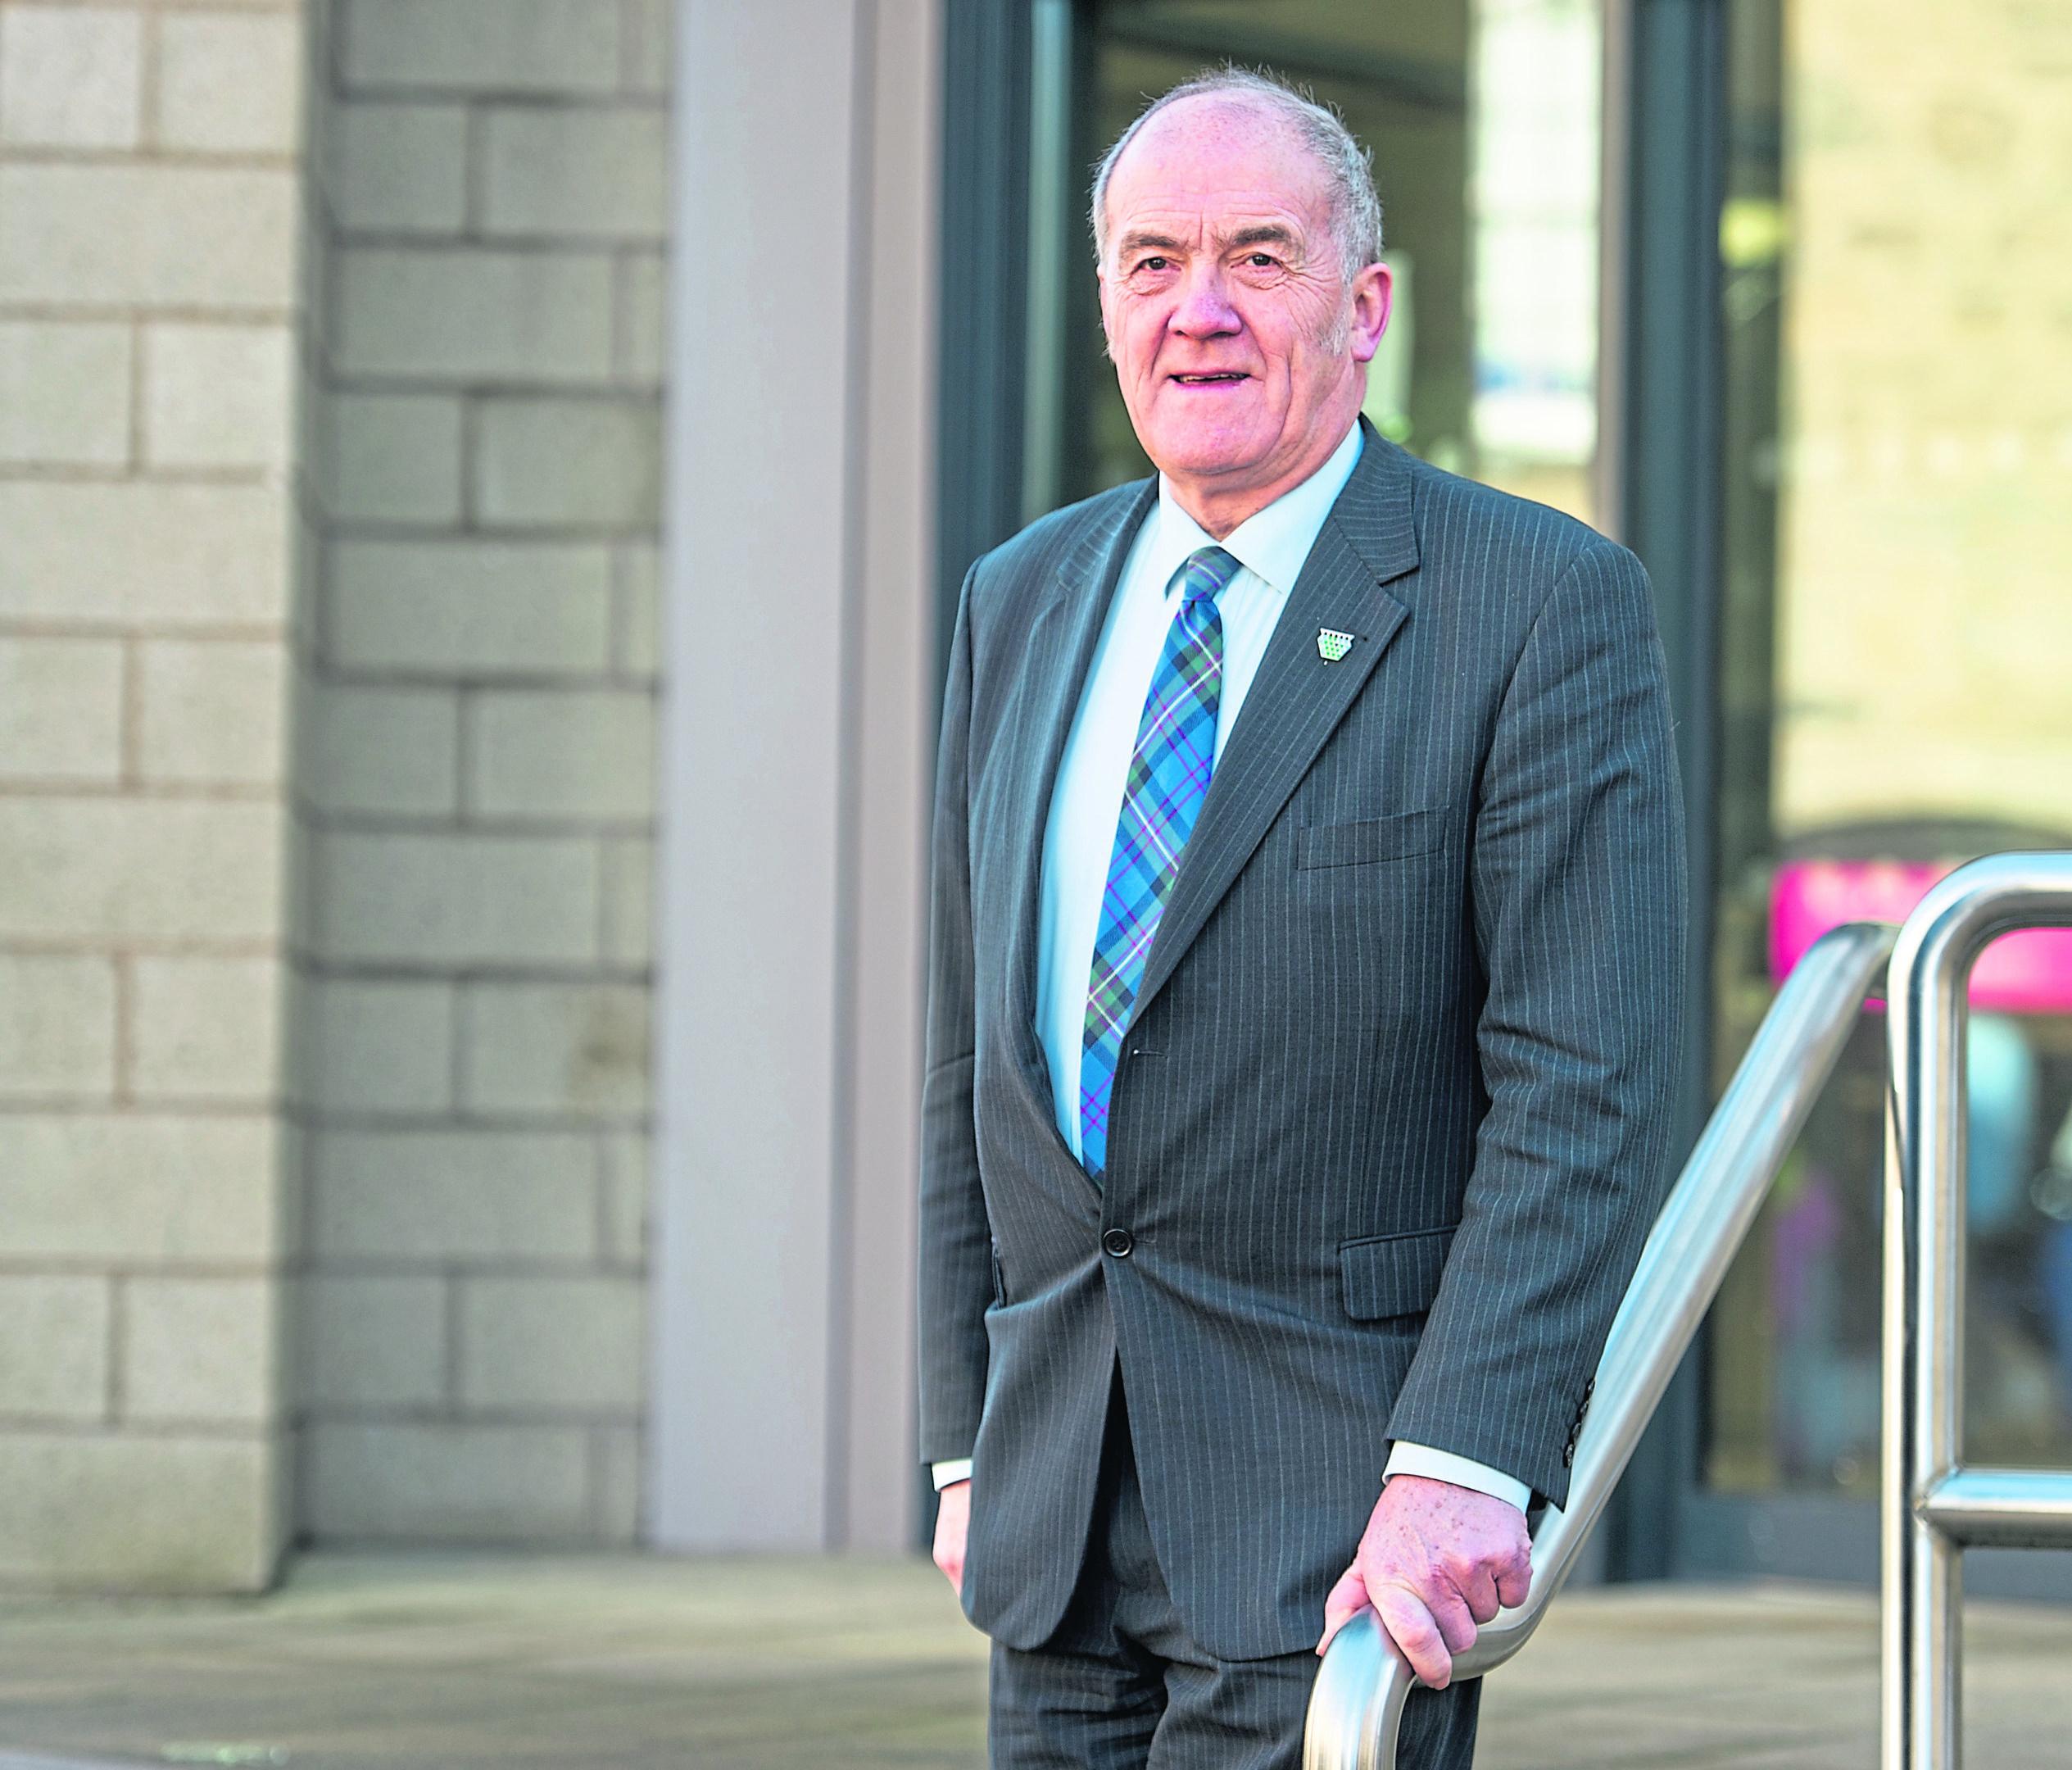 George Alexander, Moray Council Leader in Elgin.